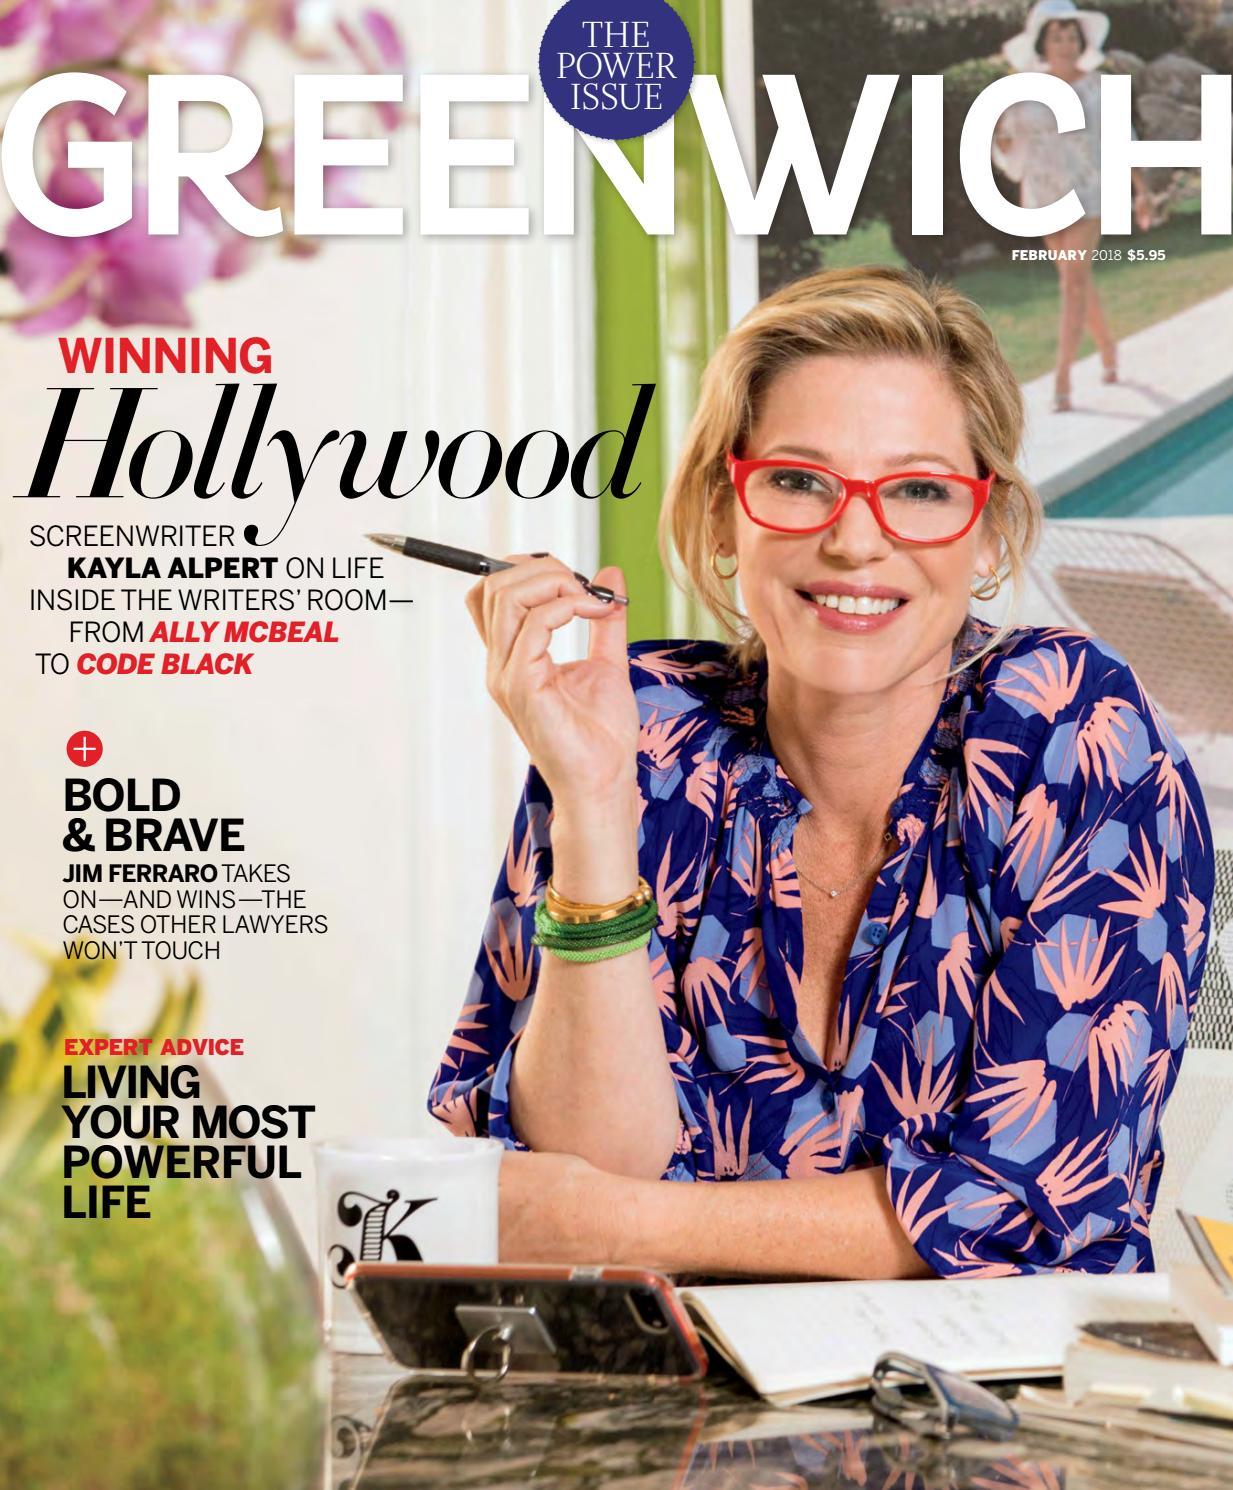 Anastasia Acosta Sexy greenwich magazine, february 2018moffly media - issuu